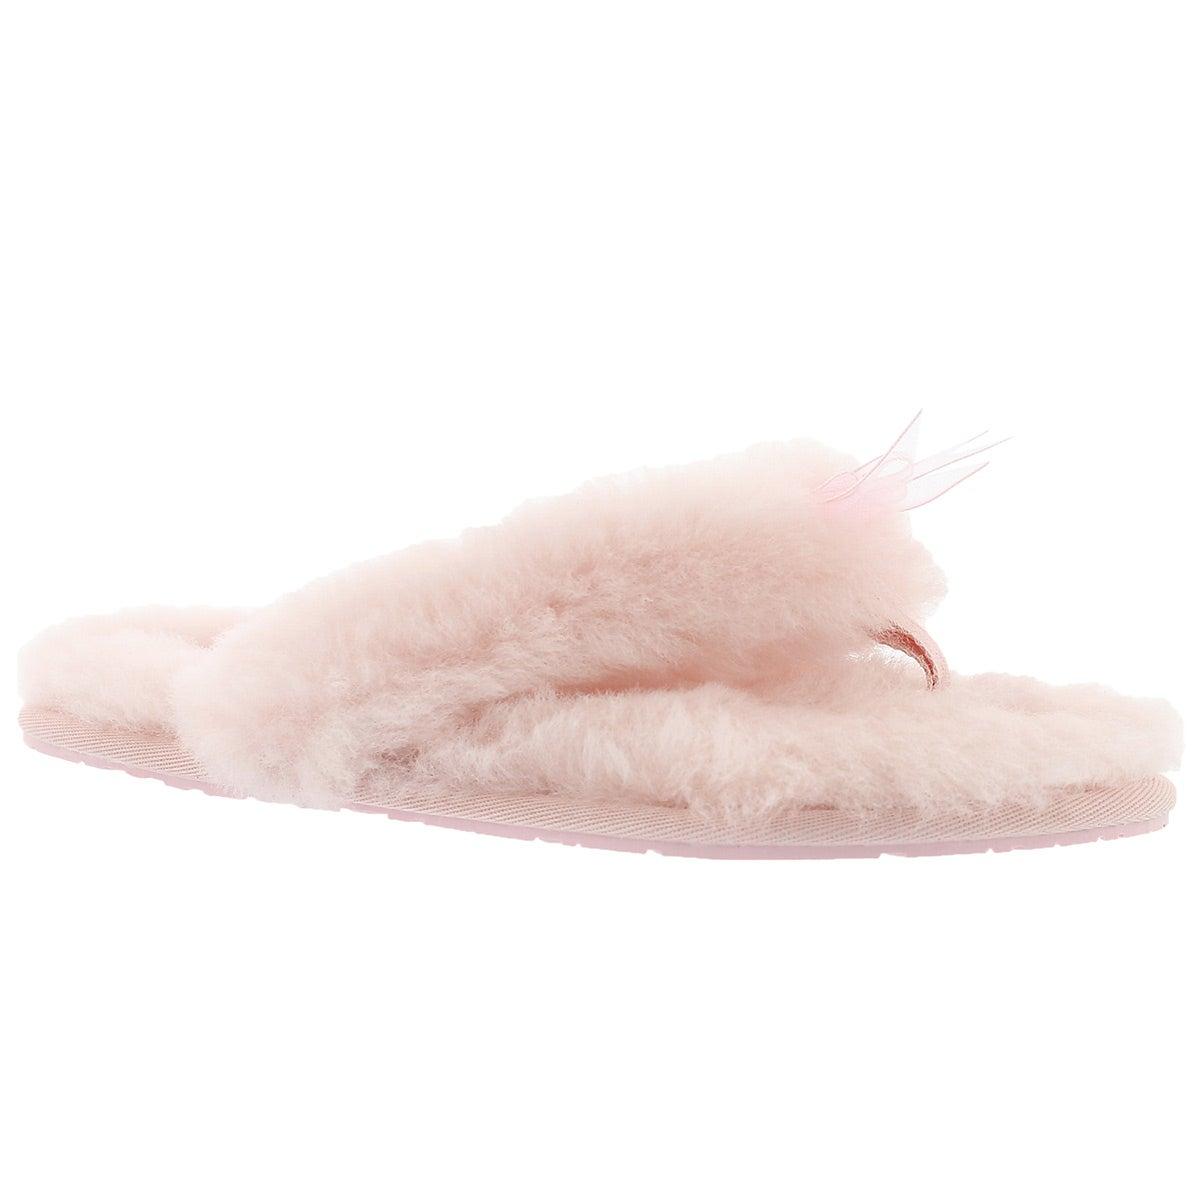 ed515587e619 Ugg Sheepskin Thong Slippers